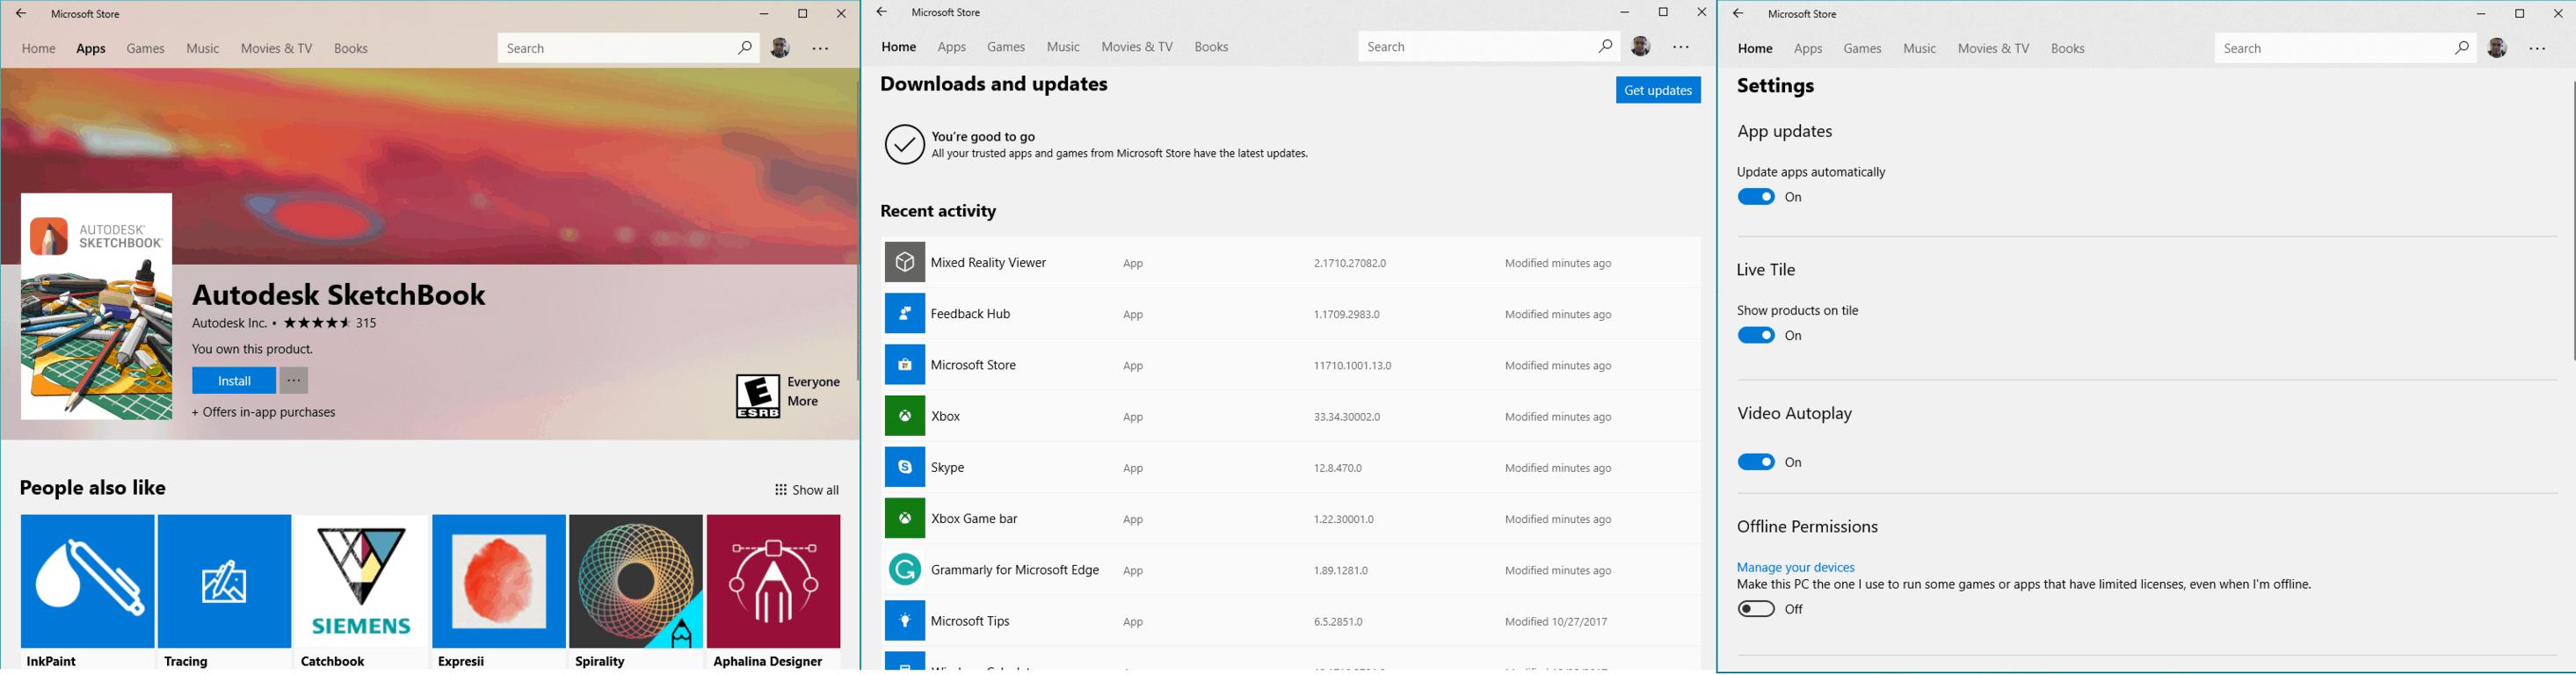 Windows 10 Microsoft Store app picks up more acrylic Fluent Design in latest Insiders update OnMSFT.com November 3, 2017